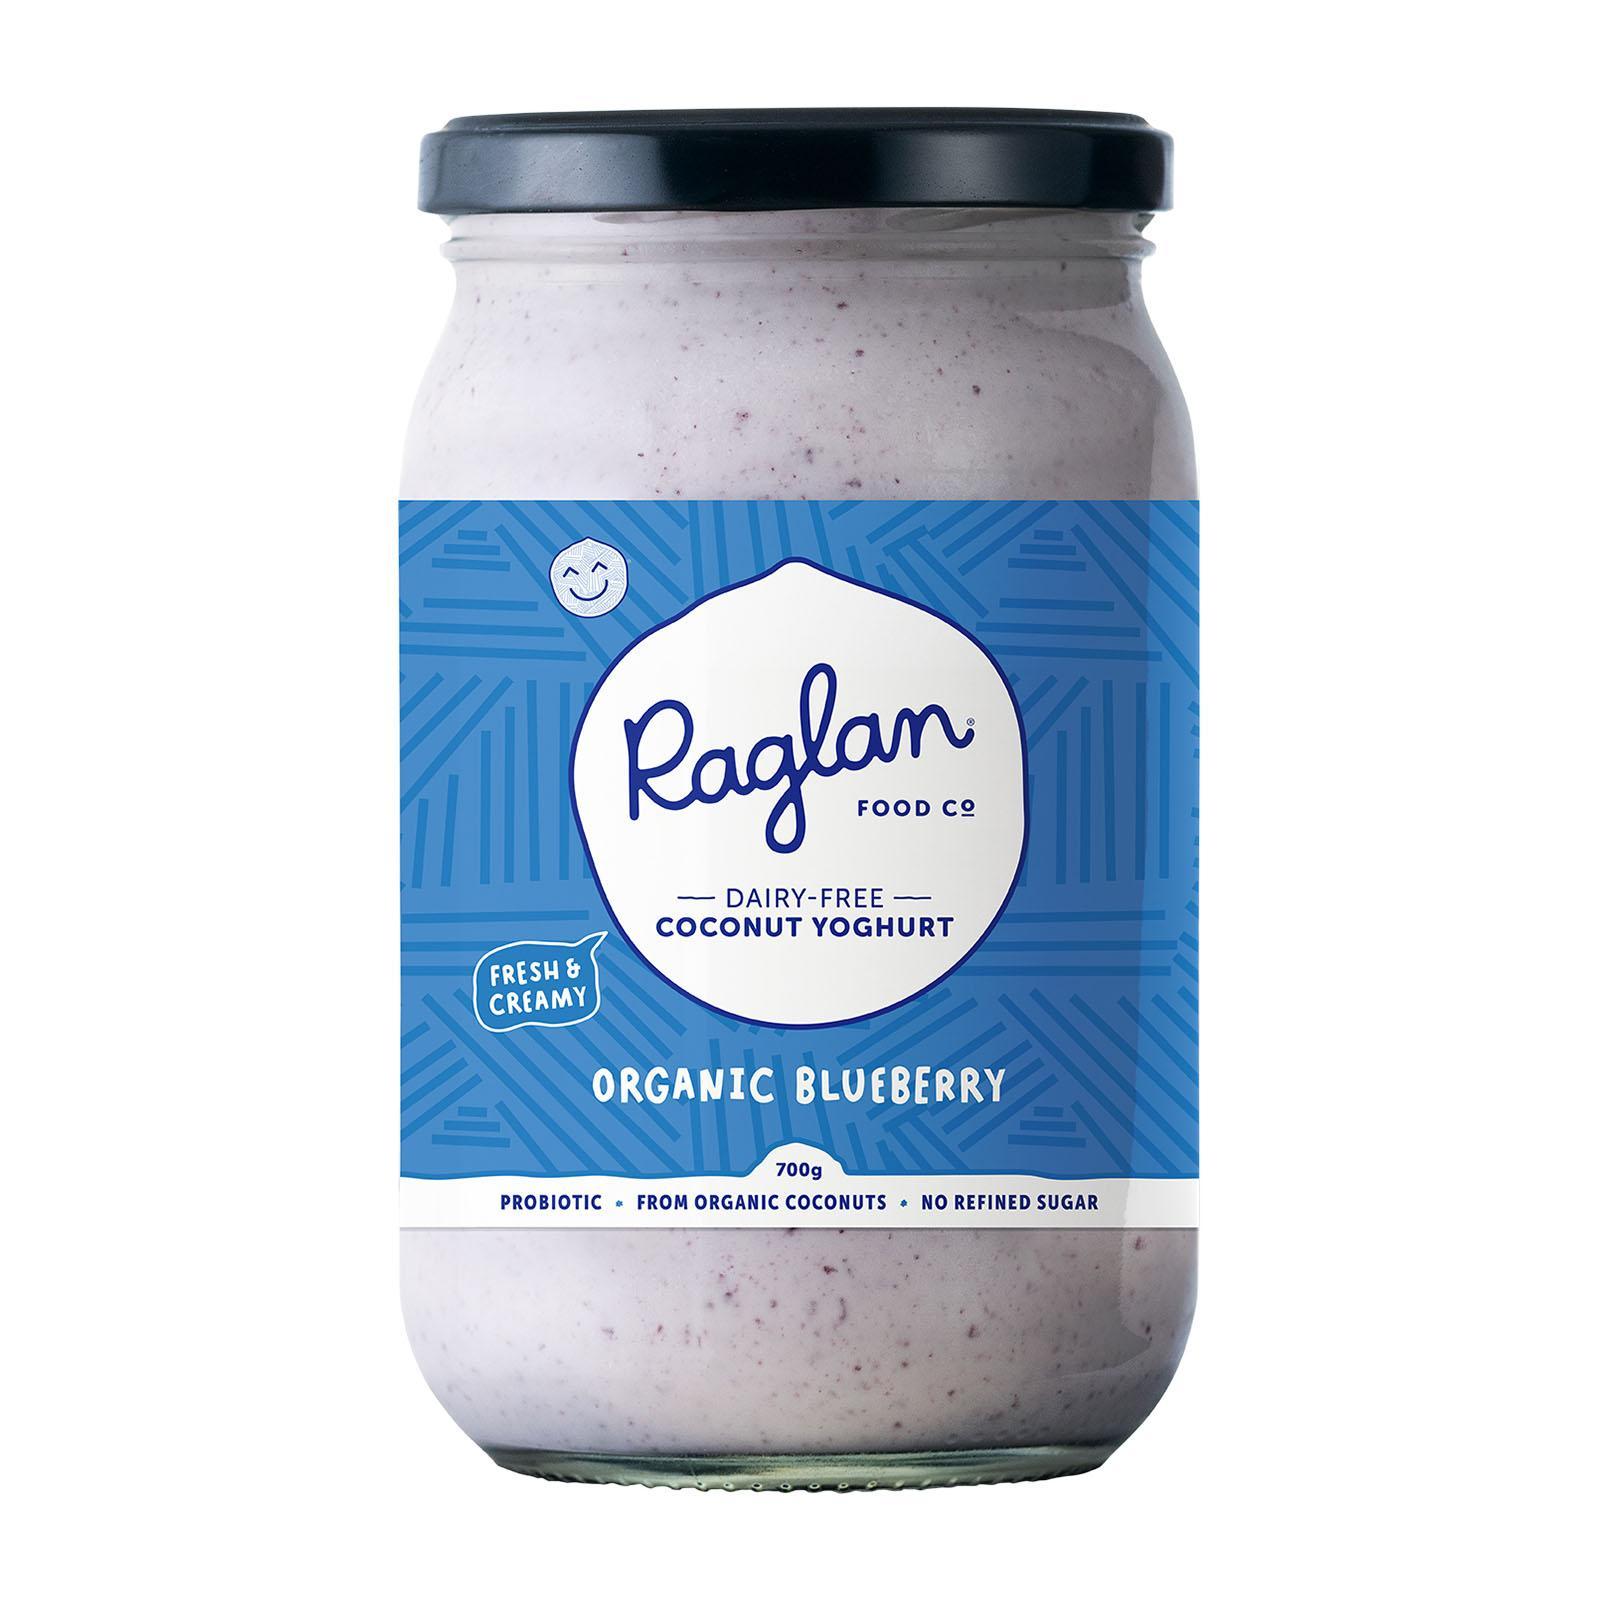 Raglan Coconut Yoghurt Organic Blueberry